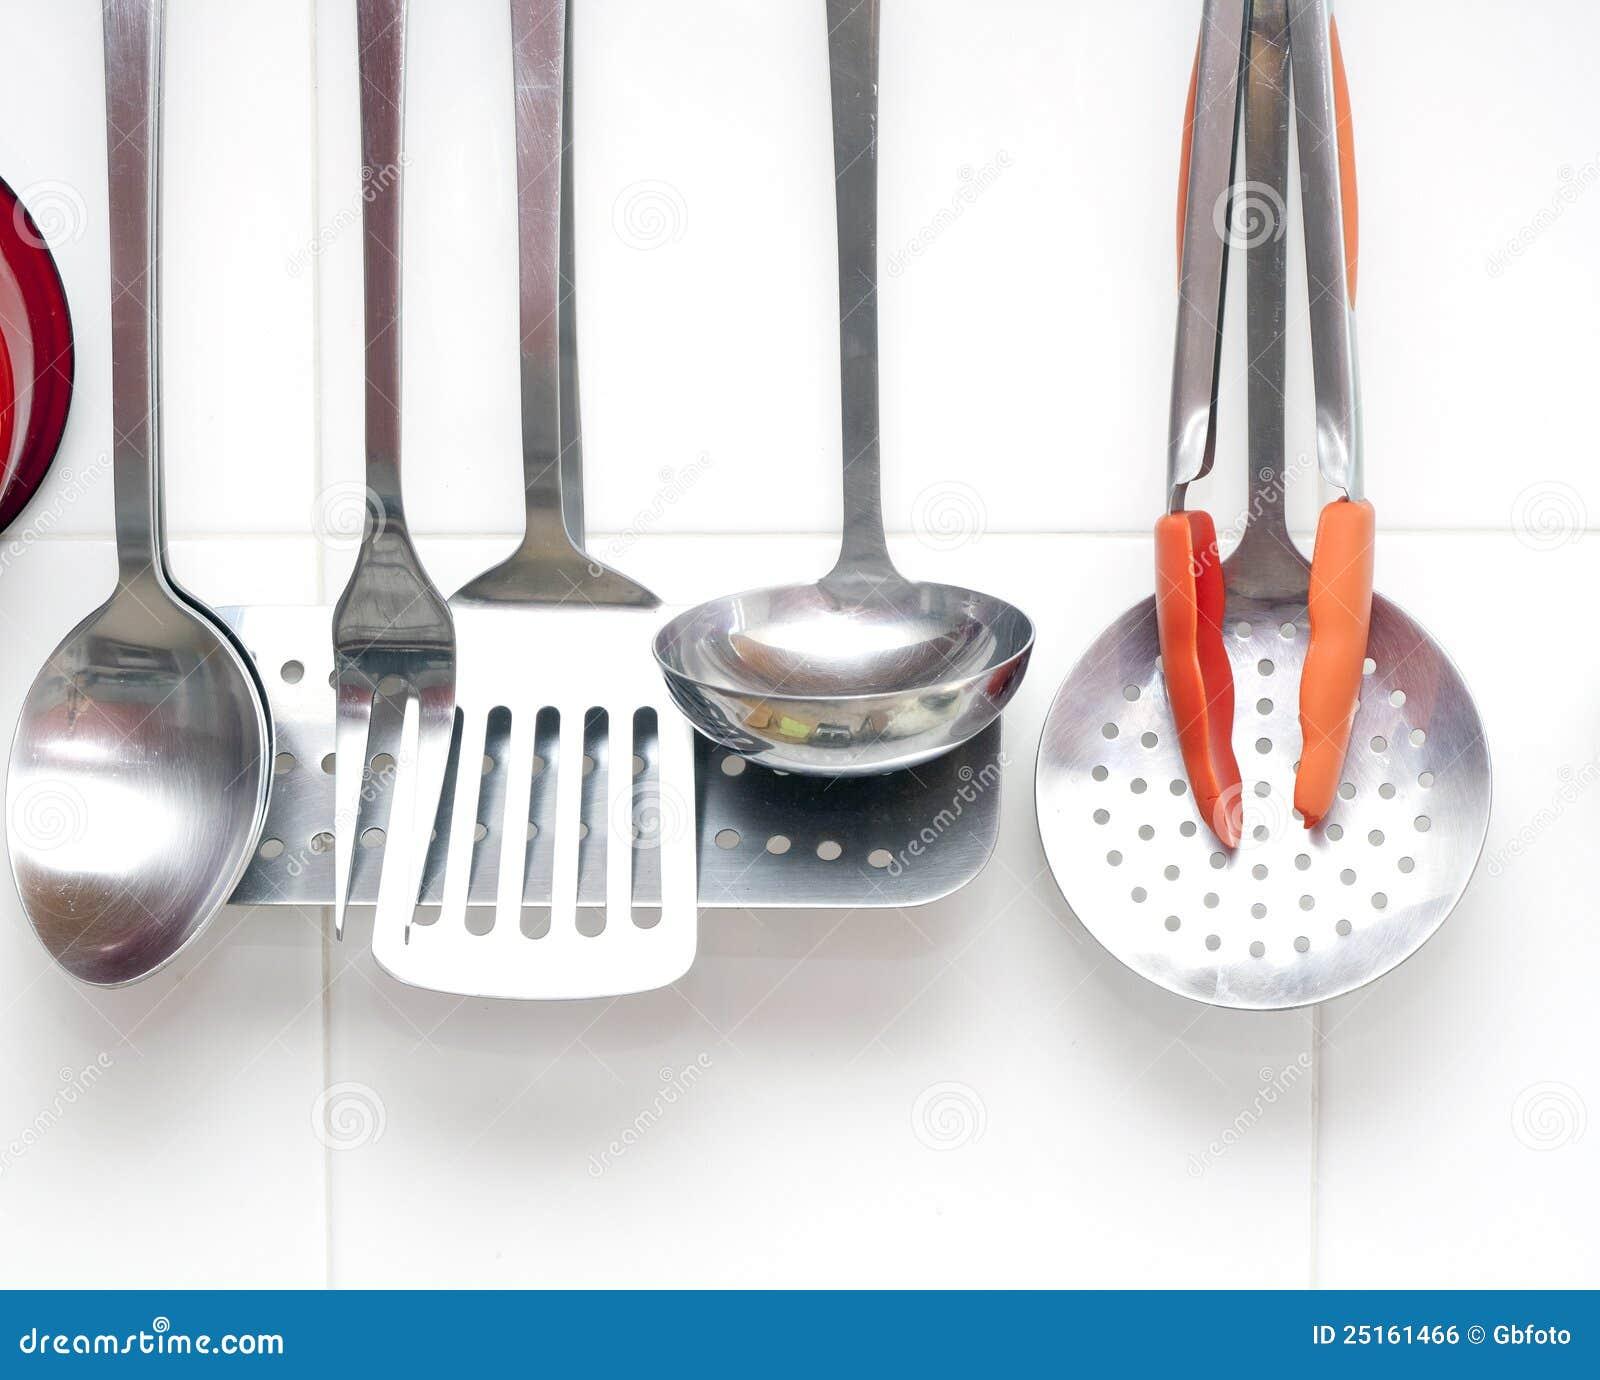 Kitchen Utensils Stock Photo Image Of Domestic